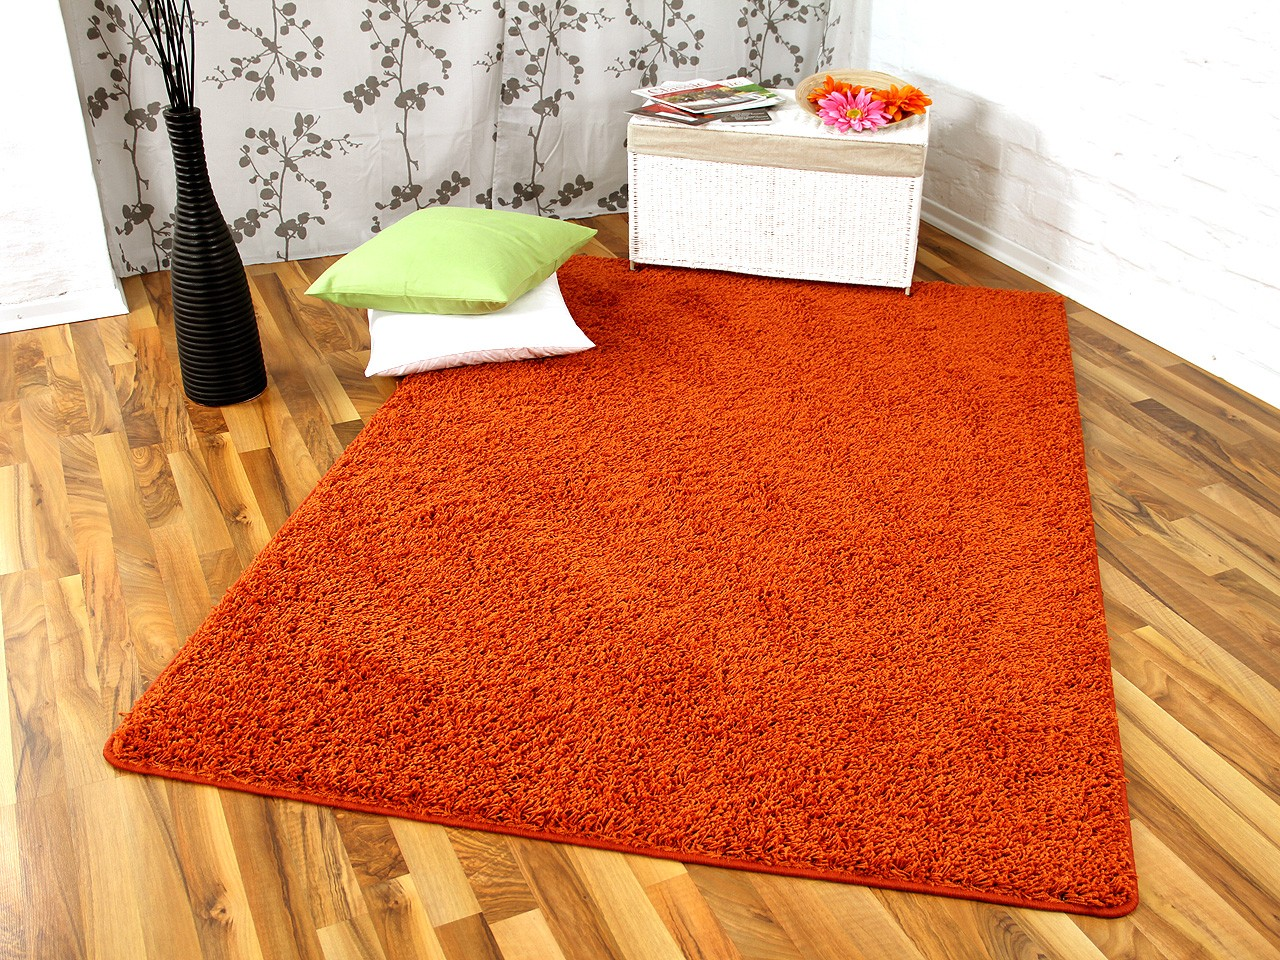 hochflor langflor teppich shaggy nova orange sonderaktion sonderposten hochflor langflor. Black Bedroom Furniture Sets. Home Design Ideas